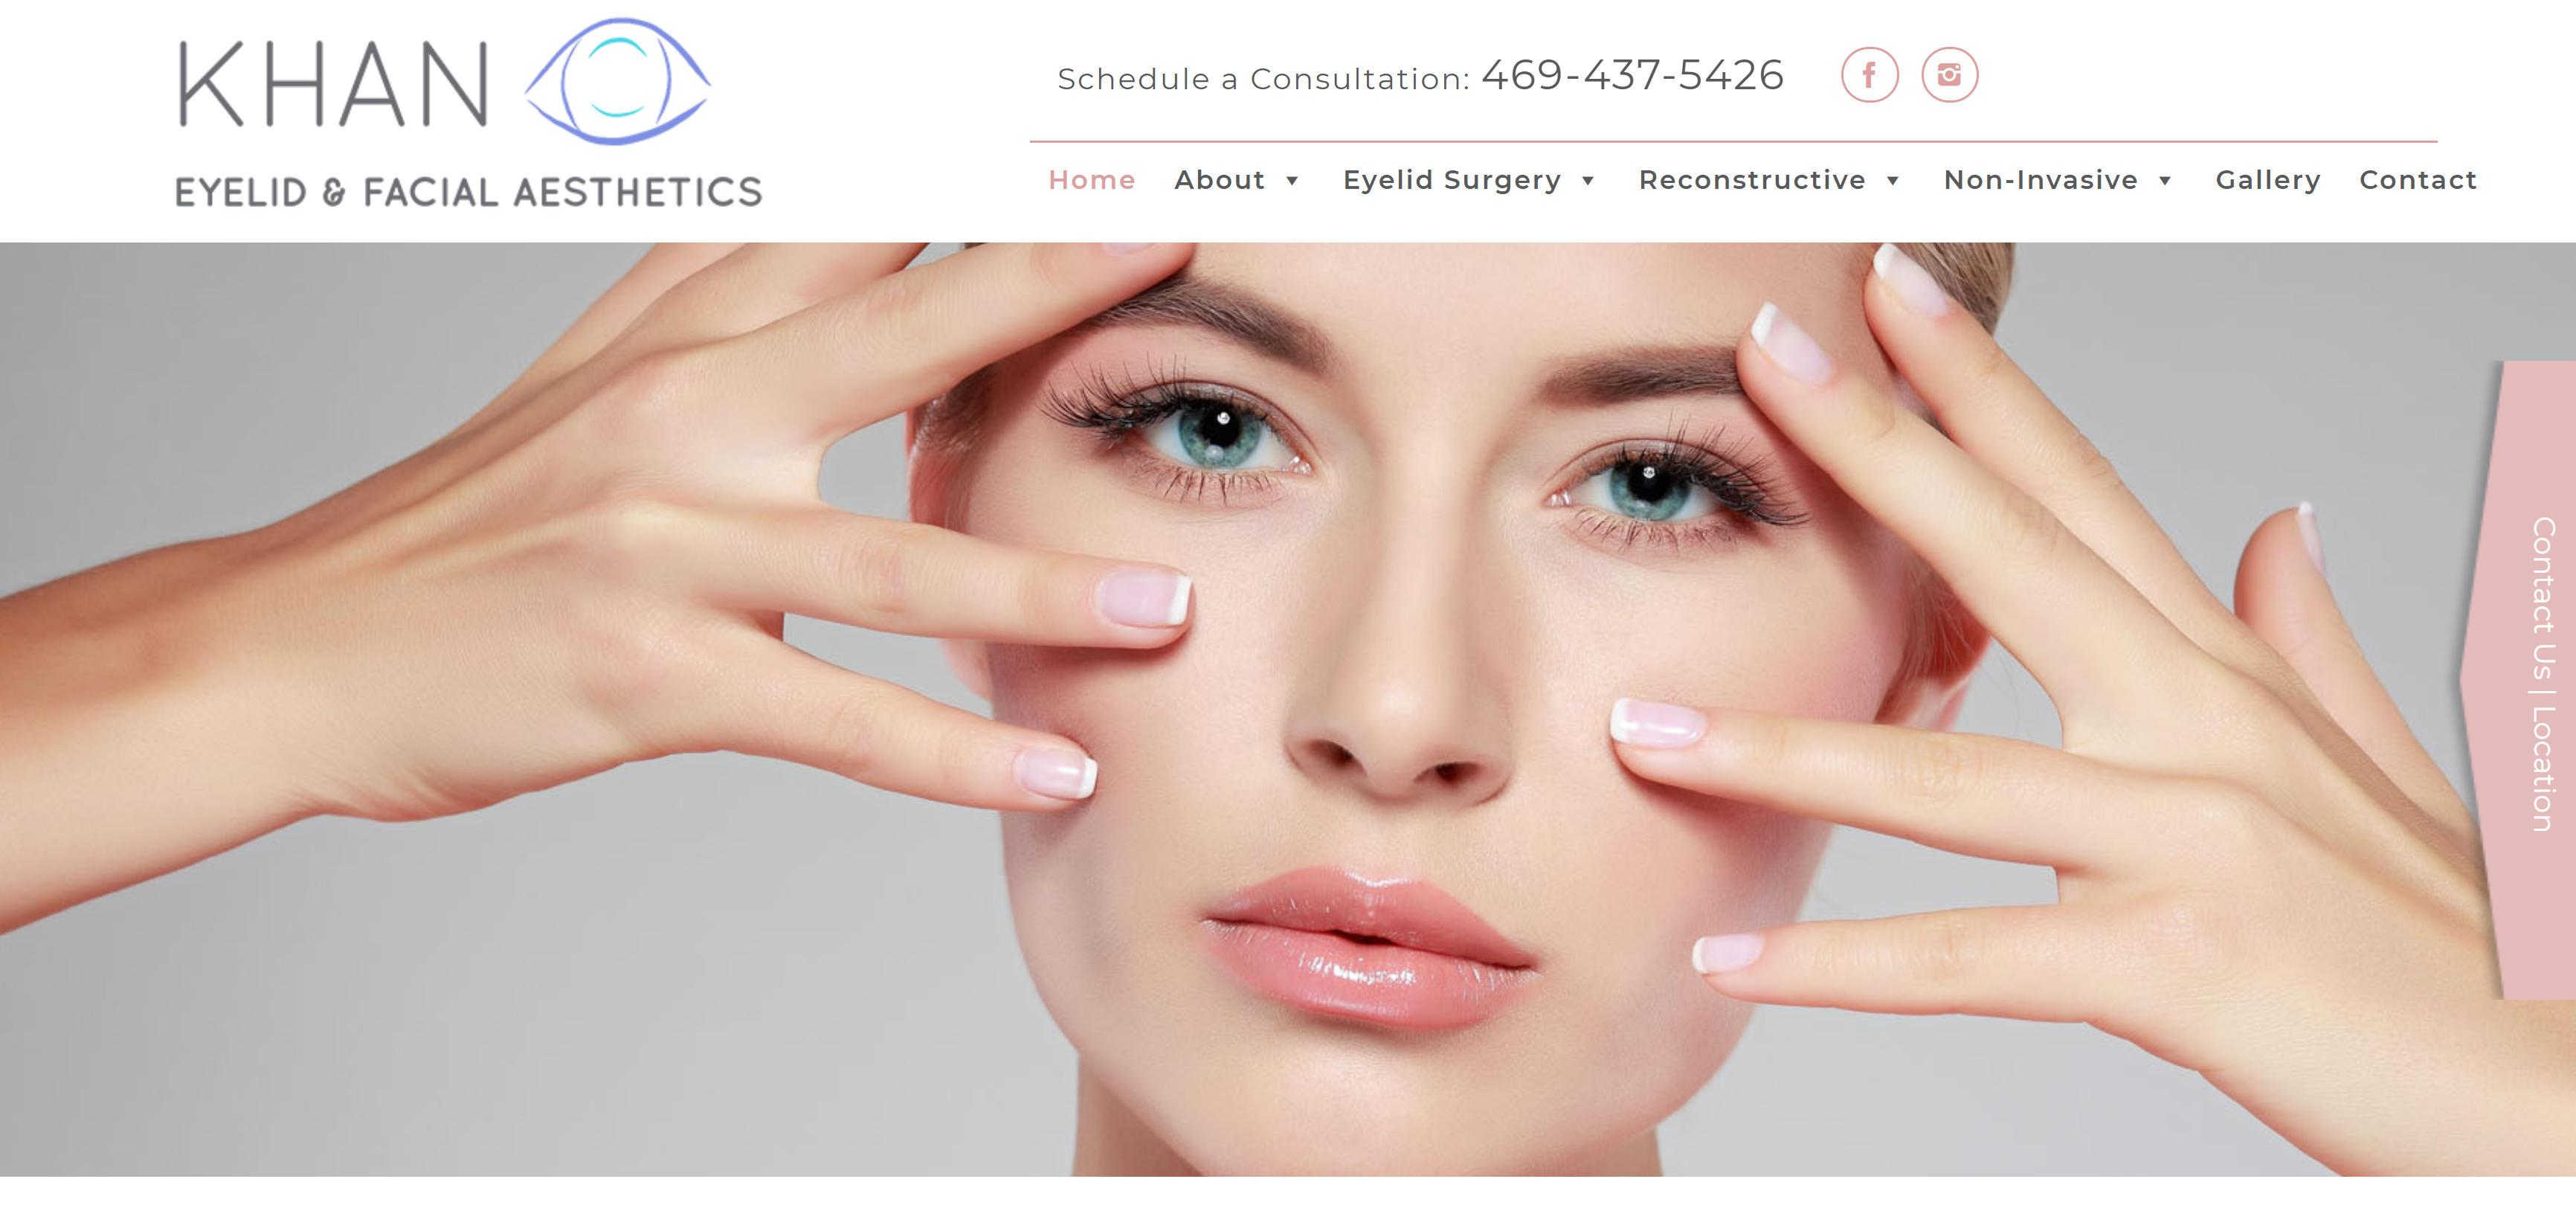 Khan Eyelid & Facial Aesthetics image 2